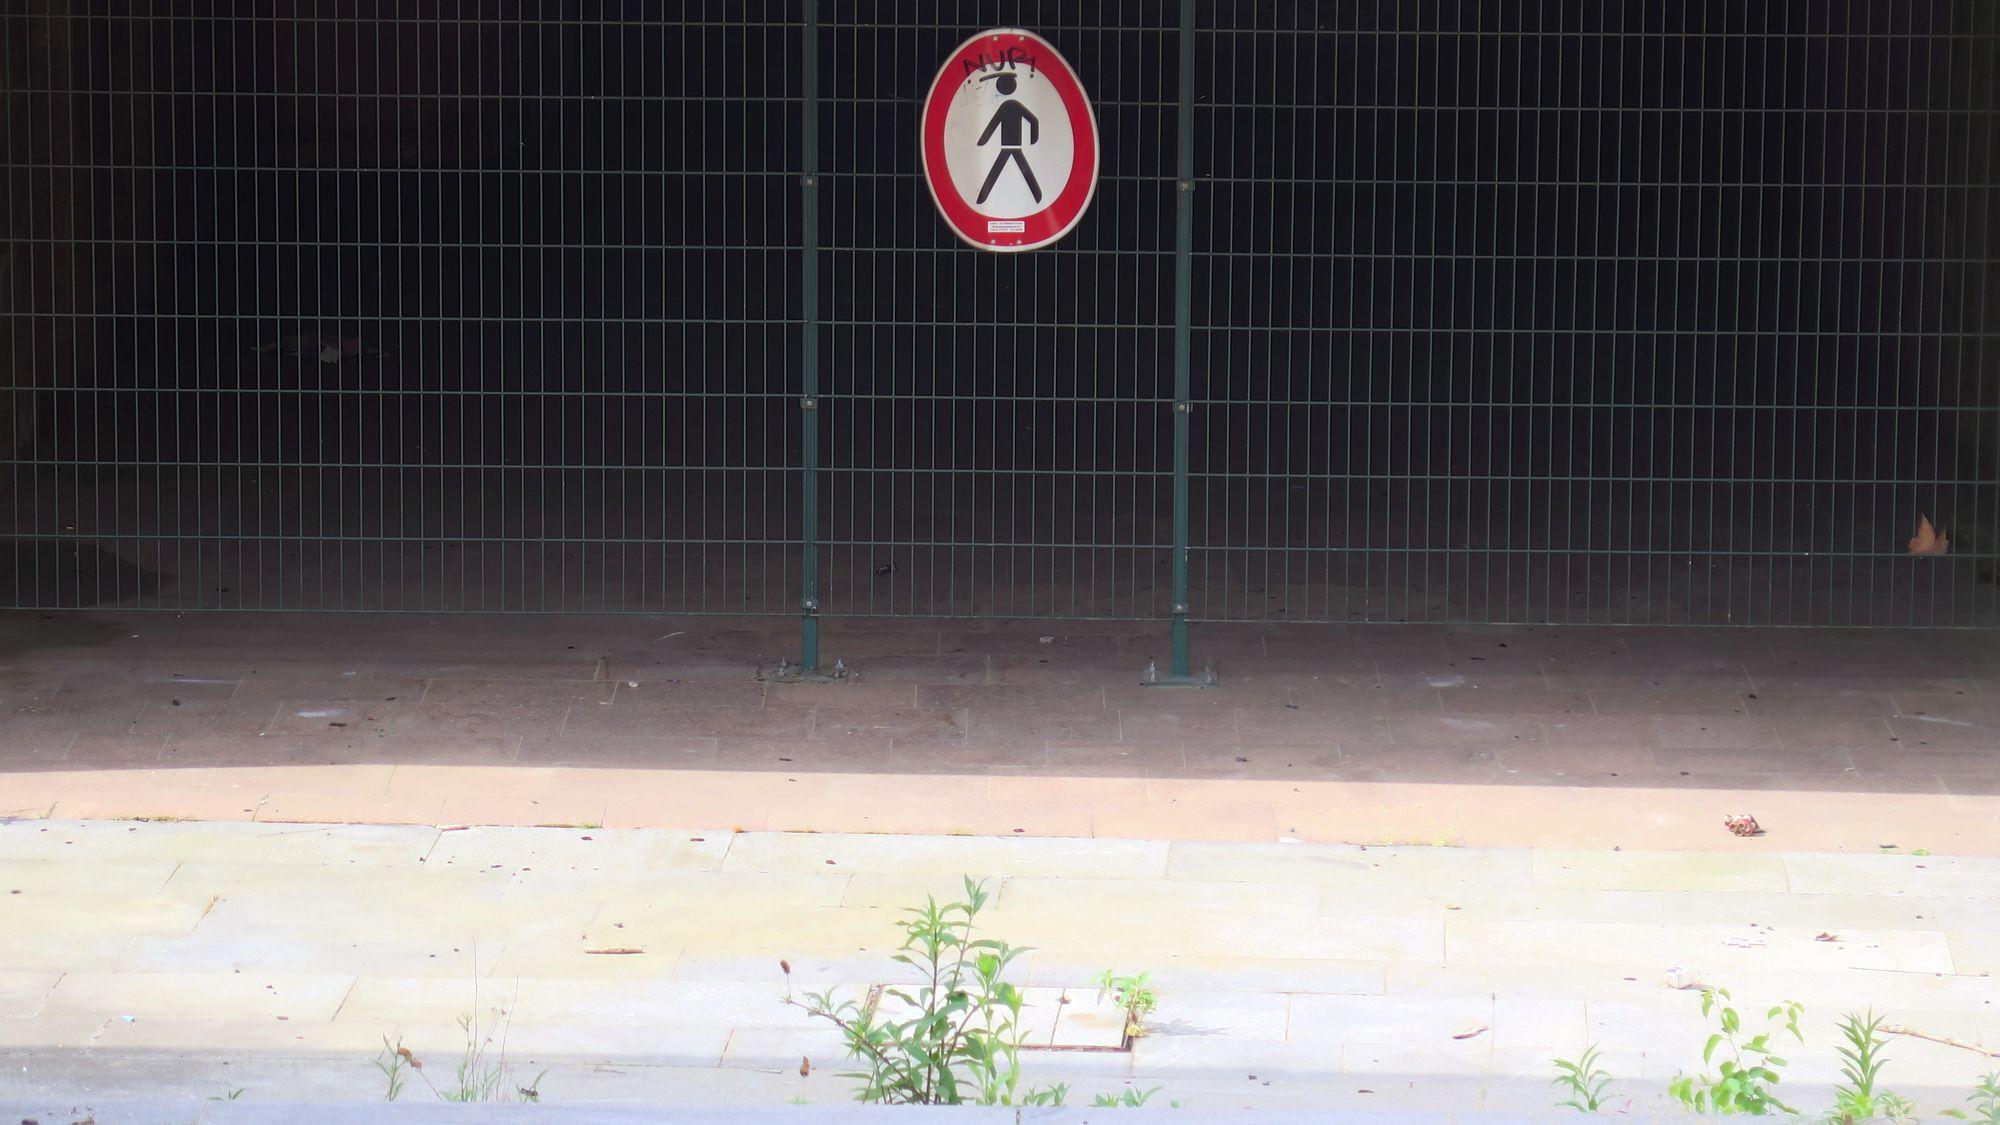 Seit knapp drei Jahren gesperrt - Tunnel am Goldenen Reiter